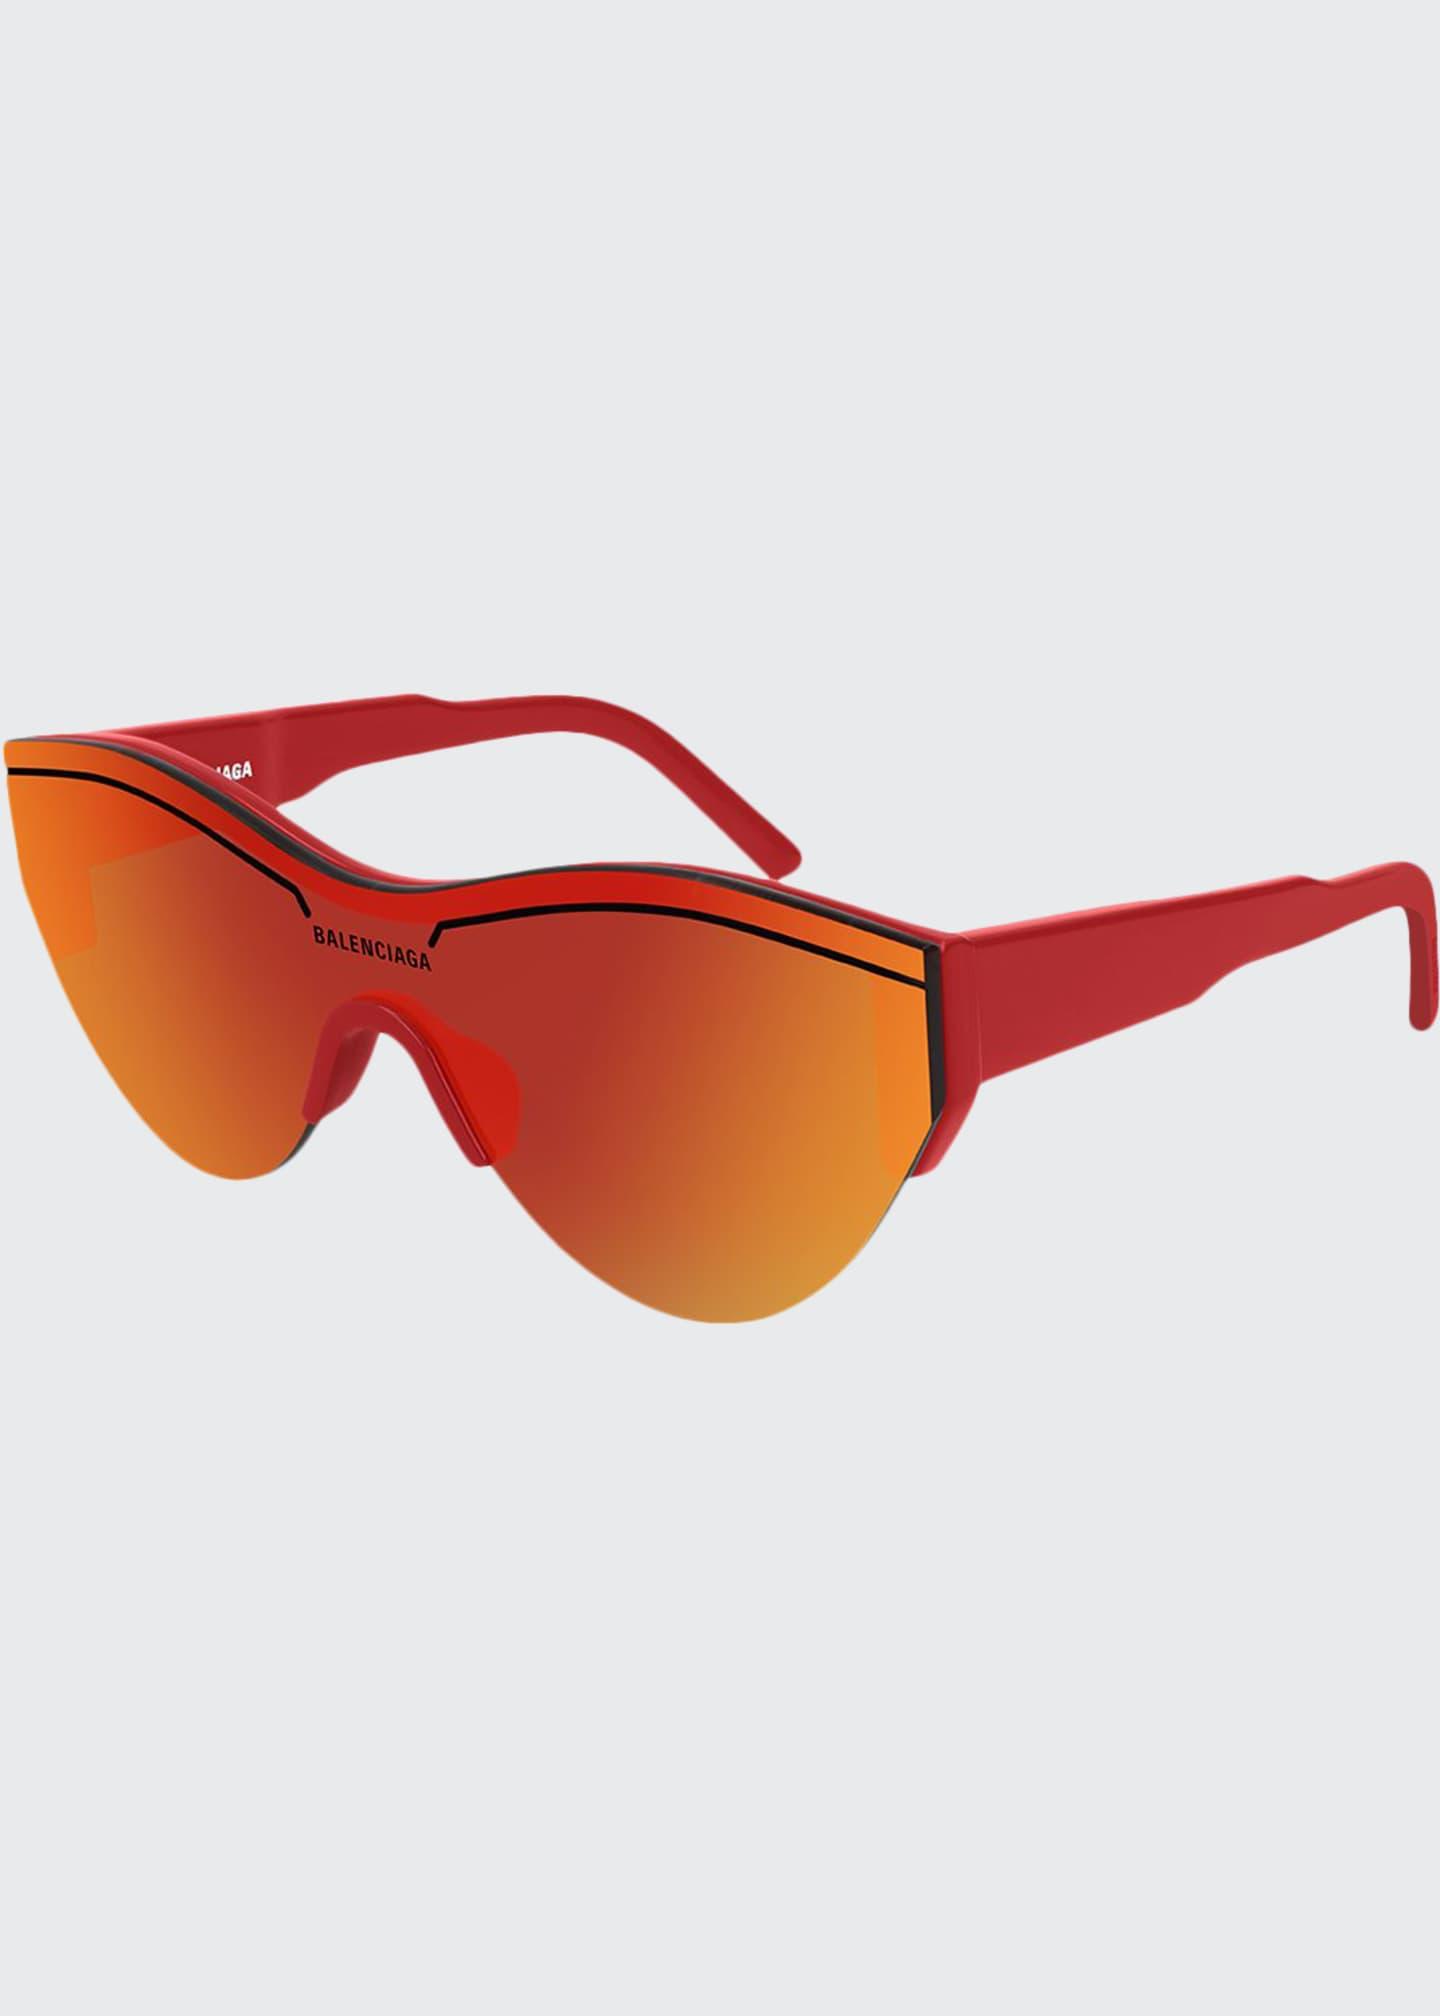 Balenciaga Men's Half-Rimmed Acetate Sunglasses